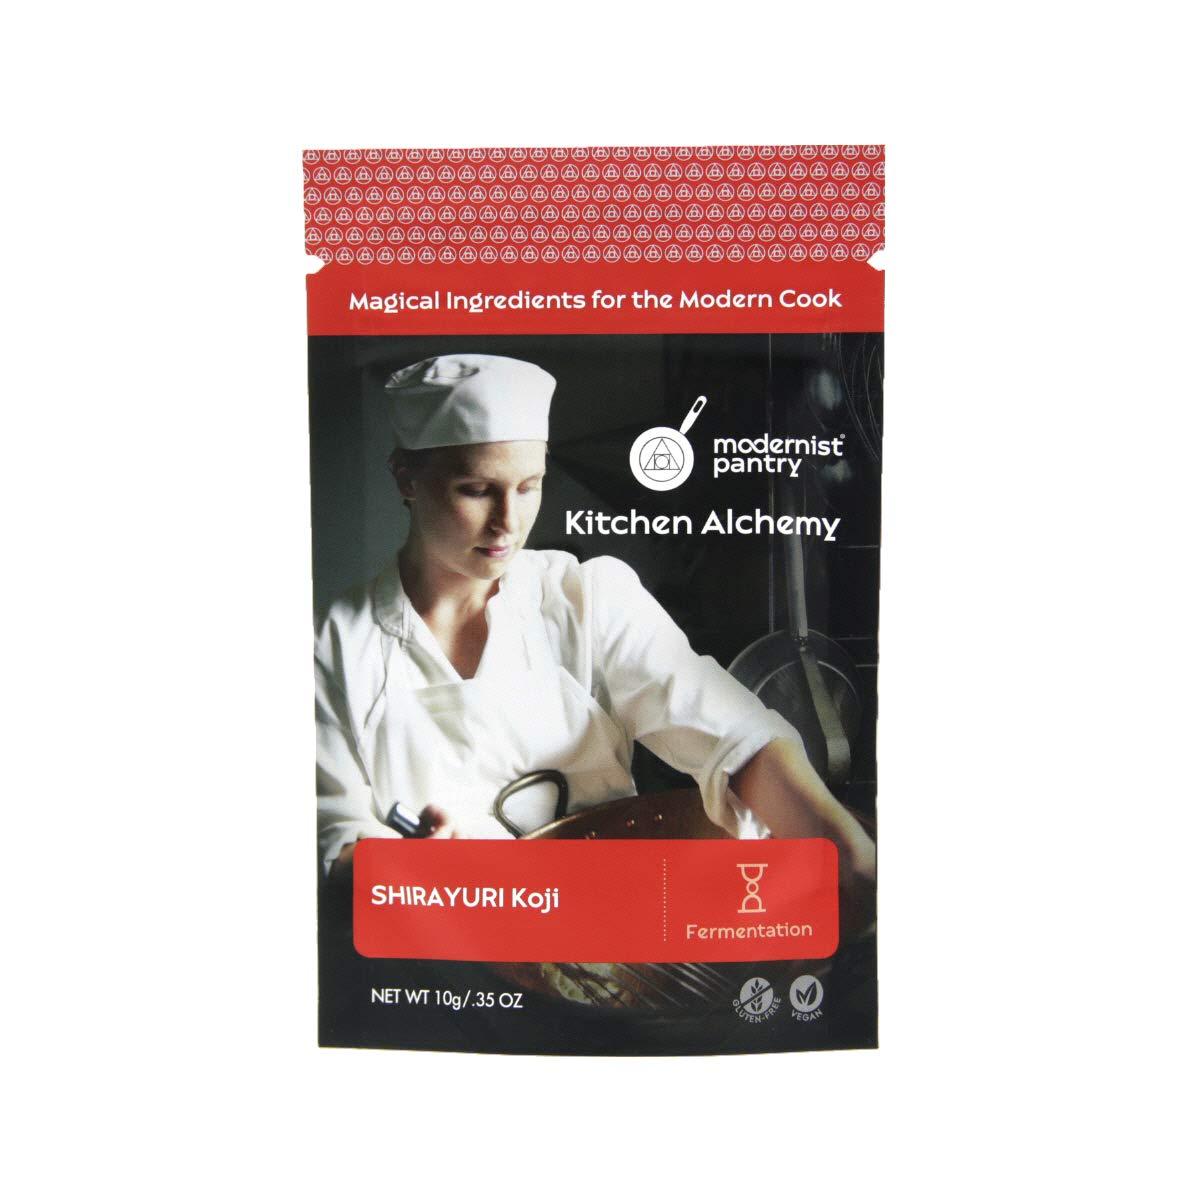 Shirayuri Koji [Aspergillus oryzae] Spores ❤ Gluten-Free ☮ Vegan - 10g/0.35oz